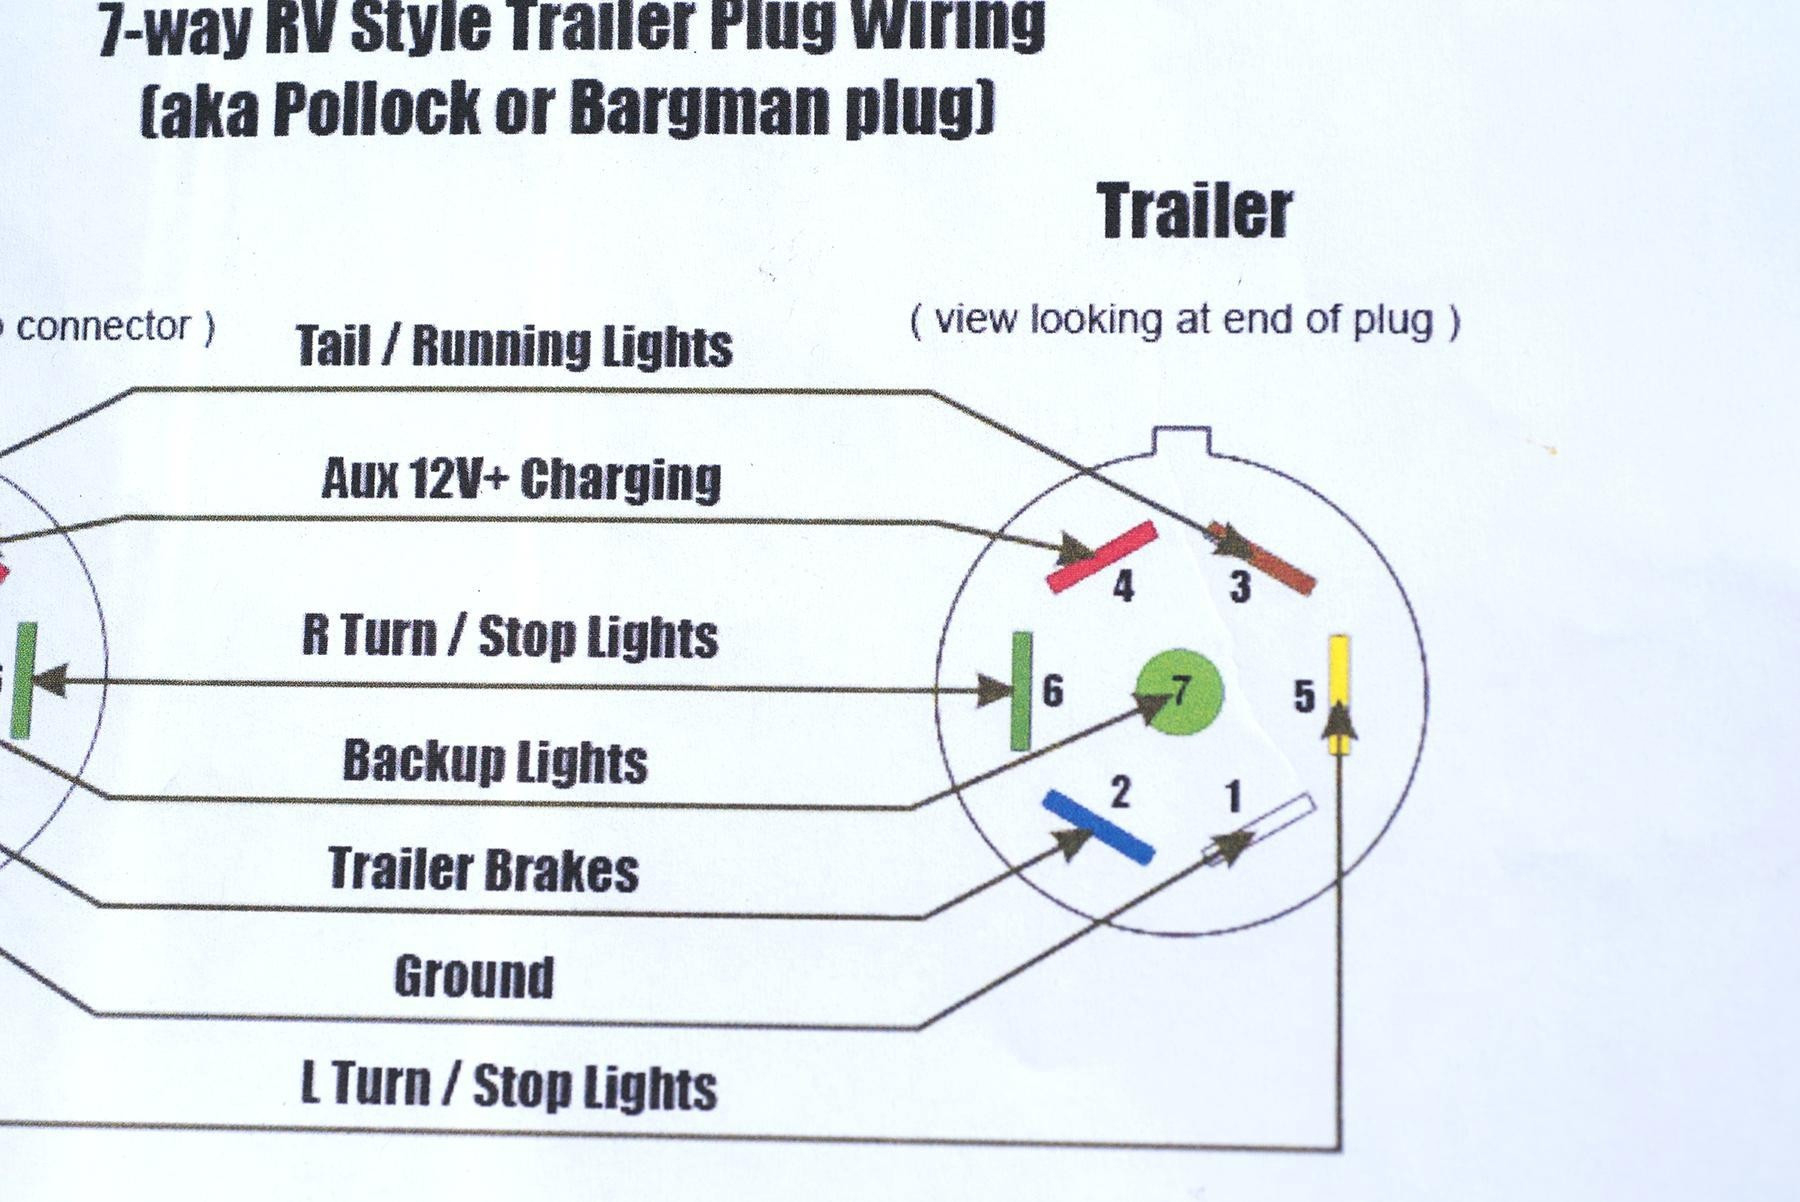 Way Trailer Plug Wiring Diagram Gmc Recent Trailer Brake Controller - Trailer Brake Wiring Diagram 7 Way